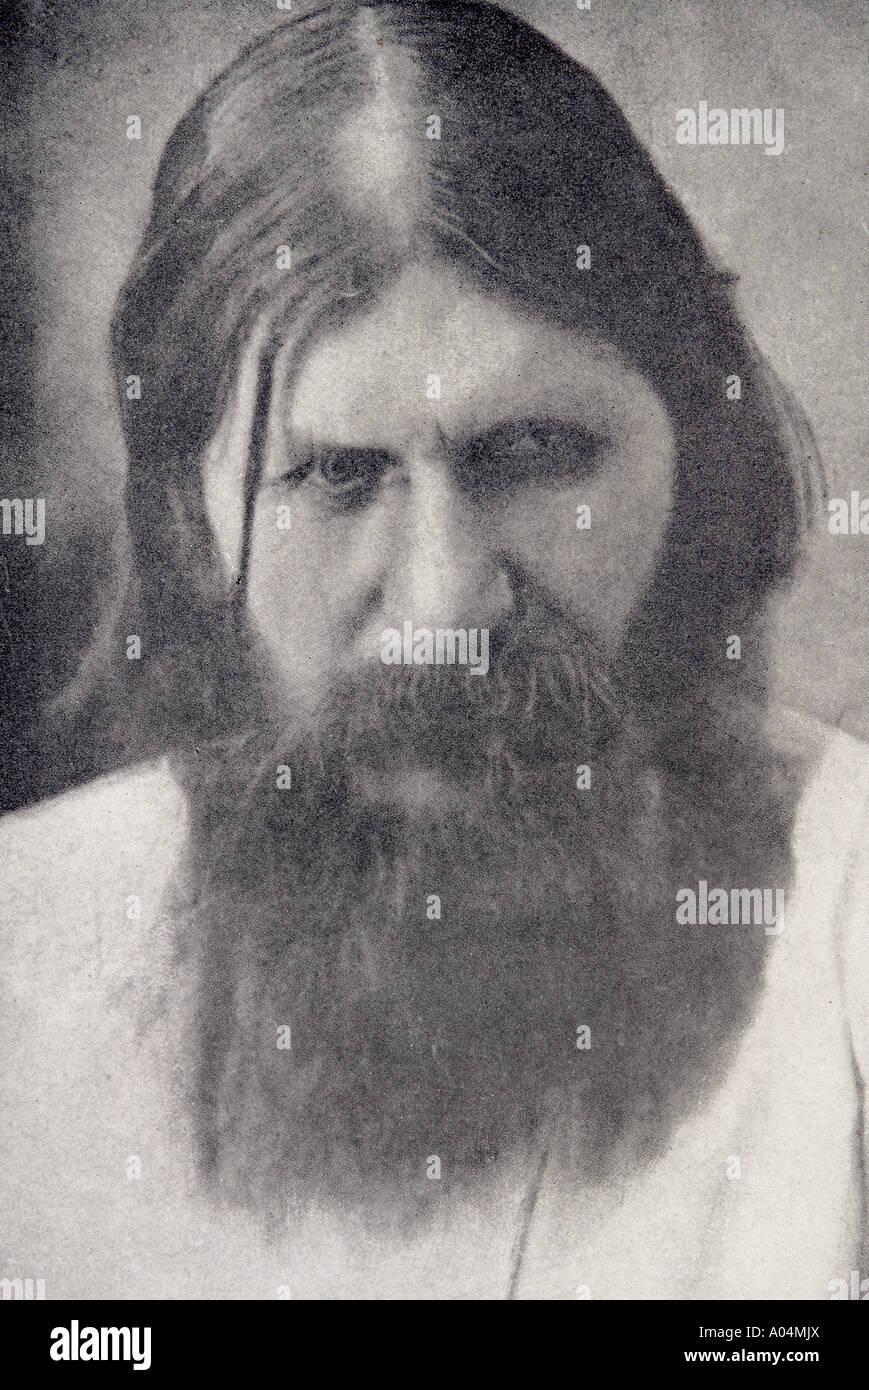 Grigory Yefimovich Rasputin 1872 to 1916 1872 1916 Russian mystic - Stock Image